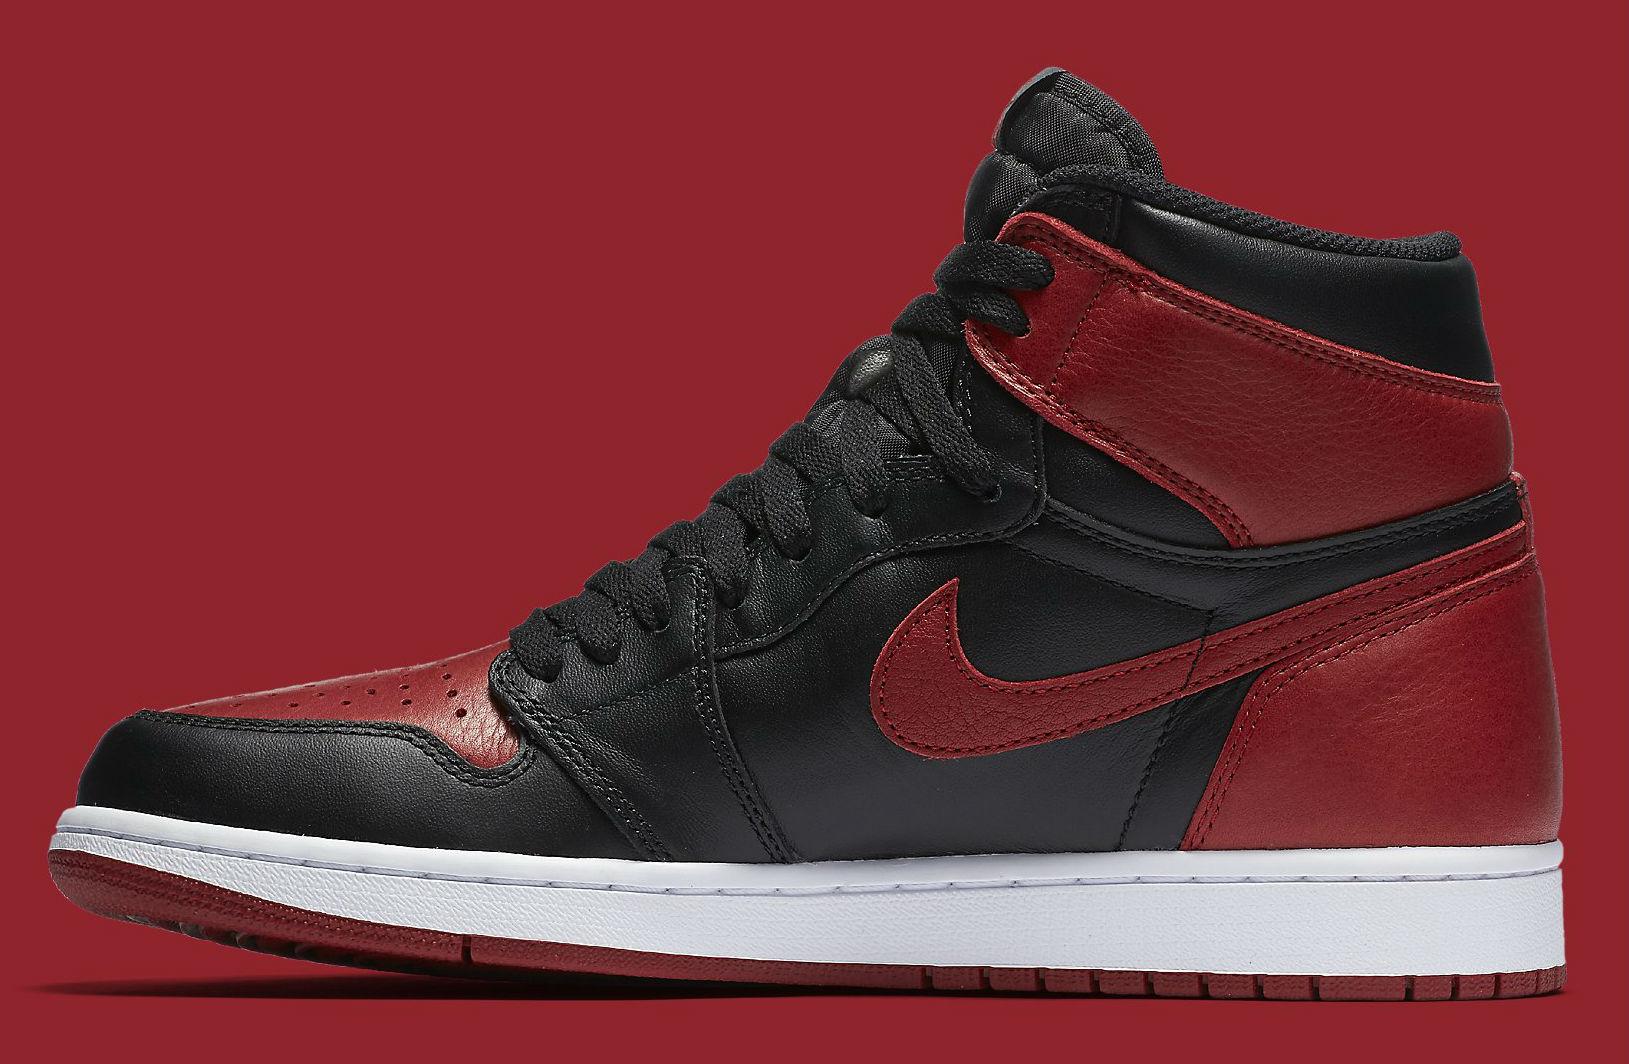 65e3696b146 Nike Air Jordan 1 Banned Nba